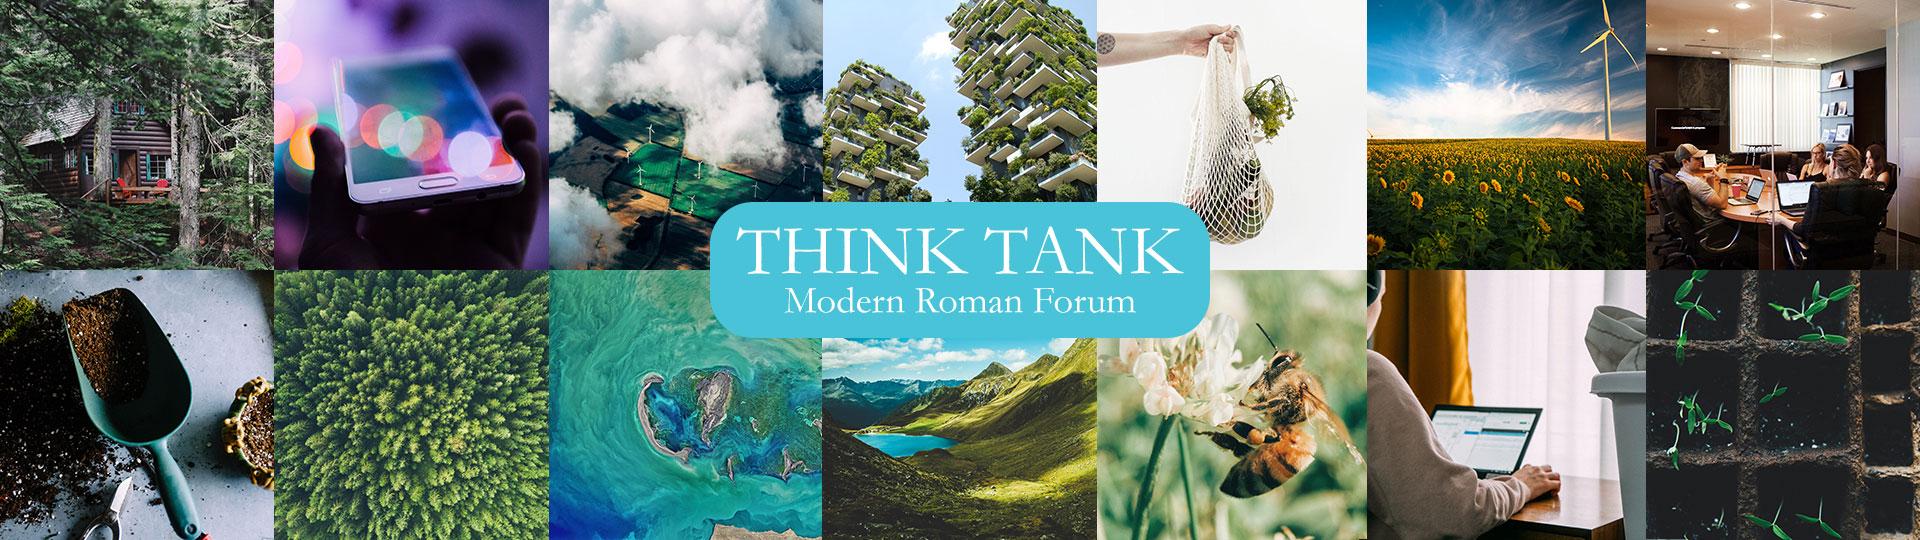 Transformation Lighthouse_tink tank_modern roman forum